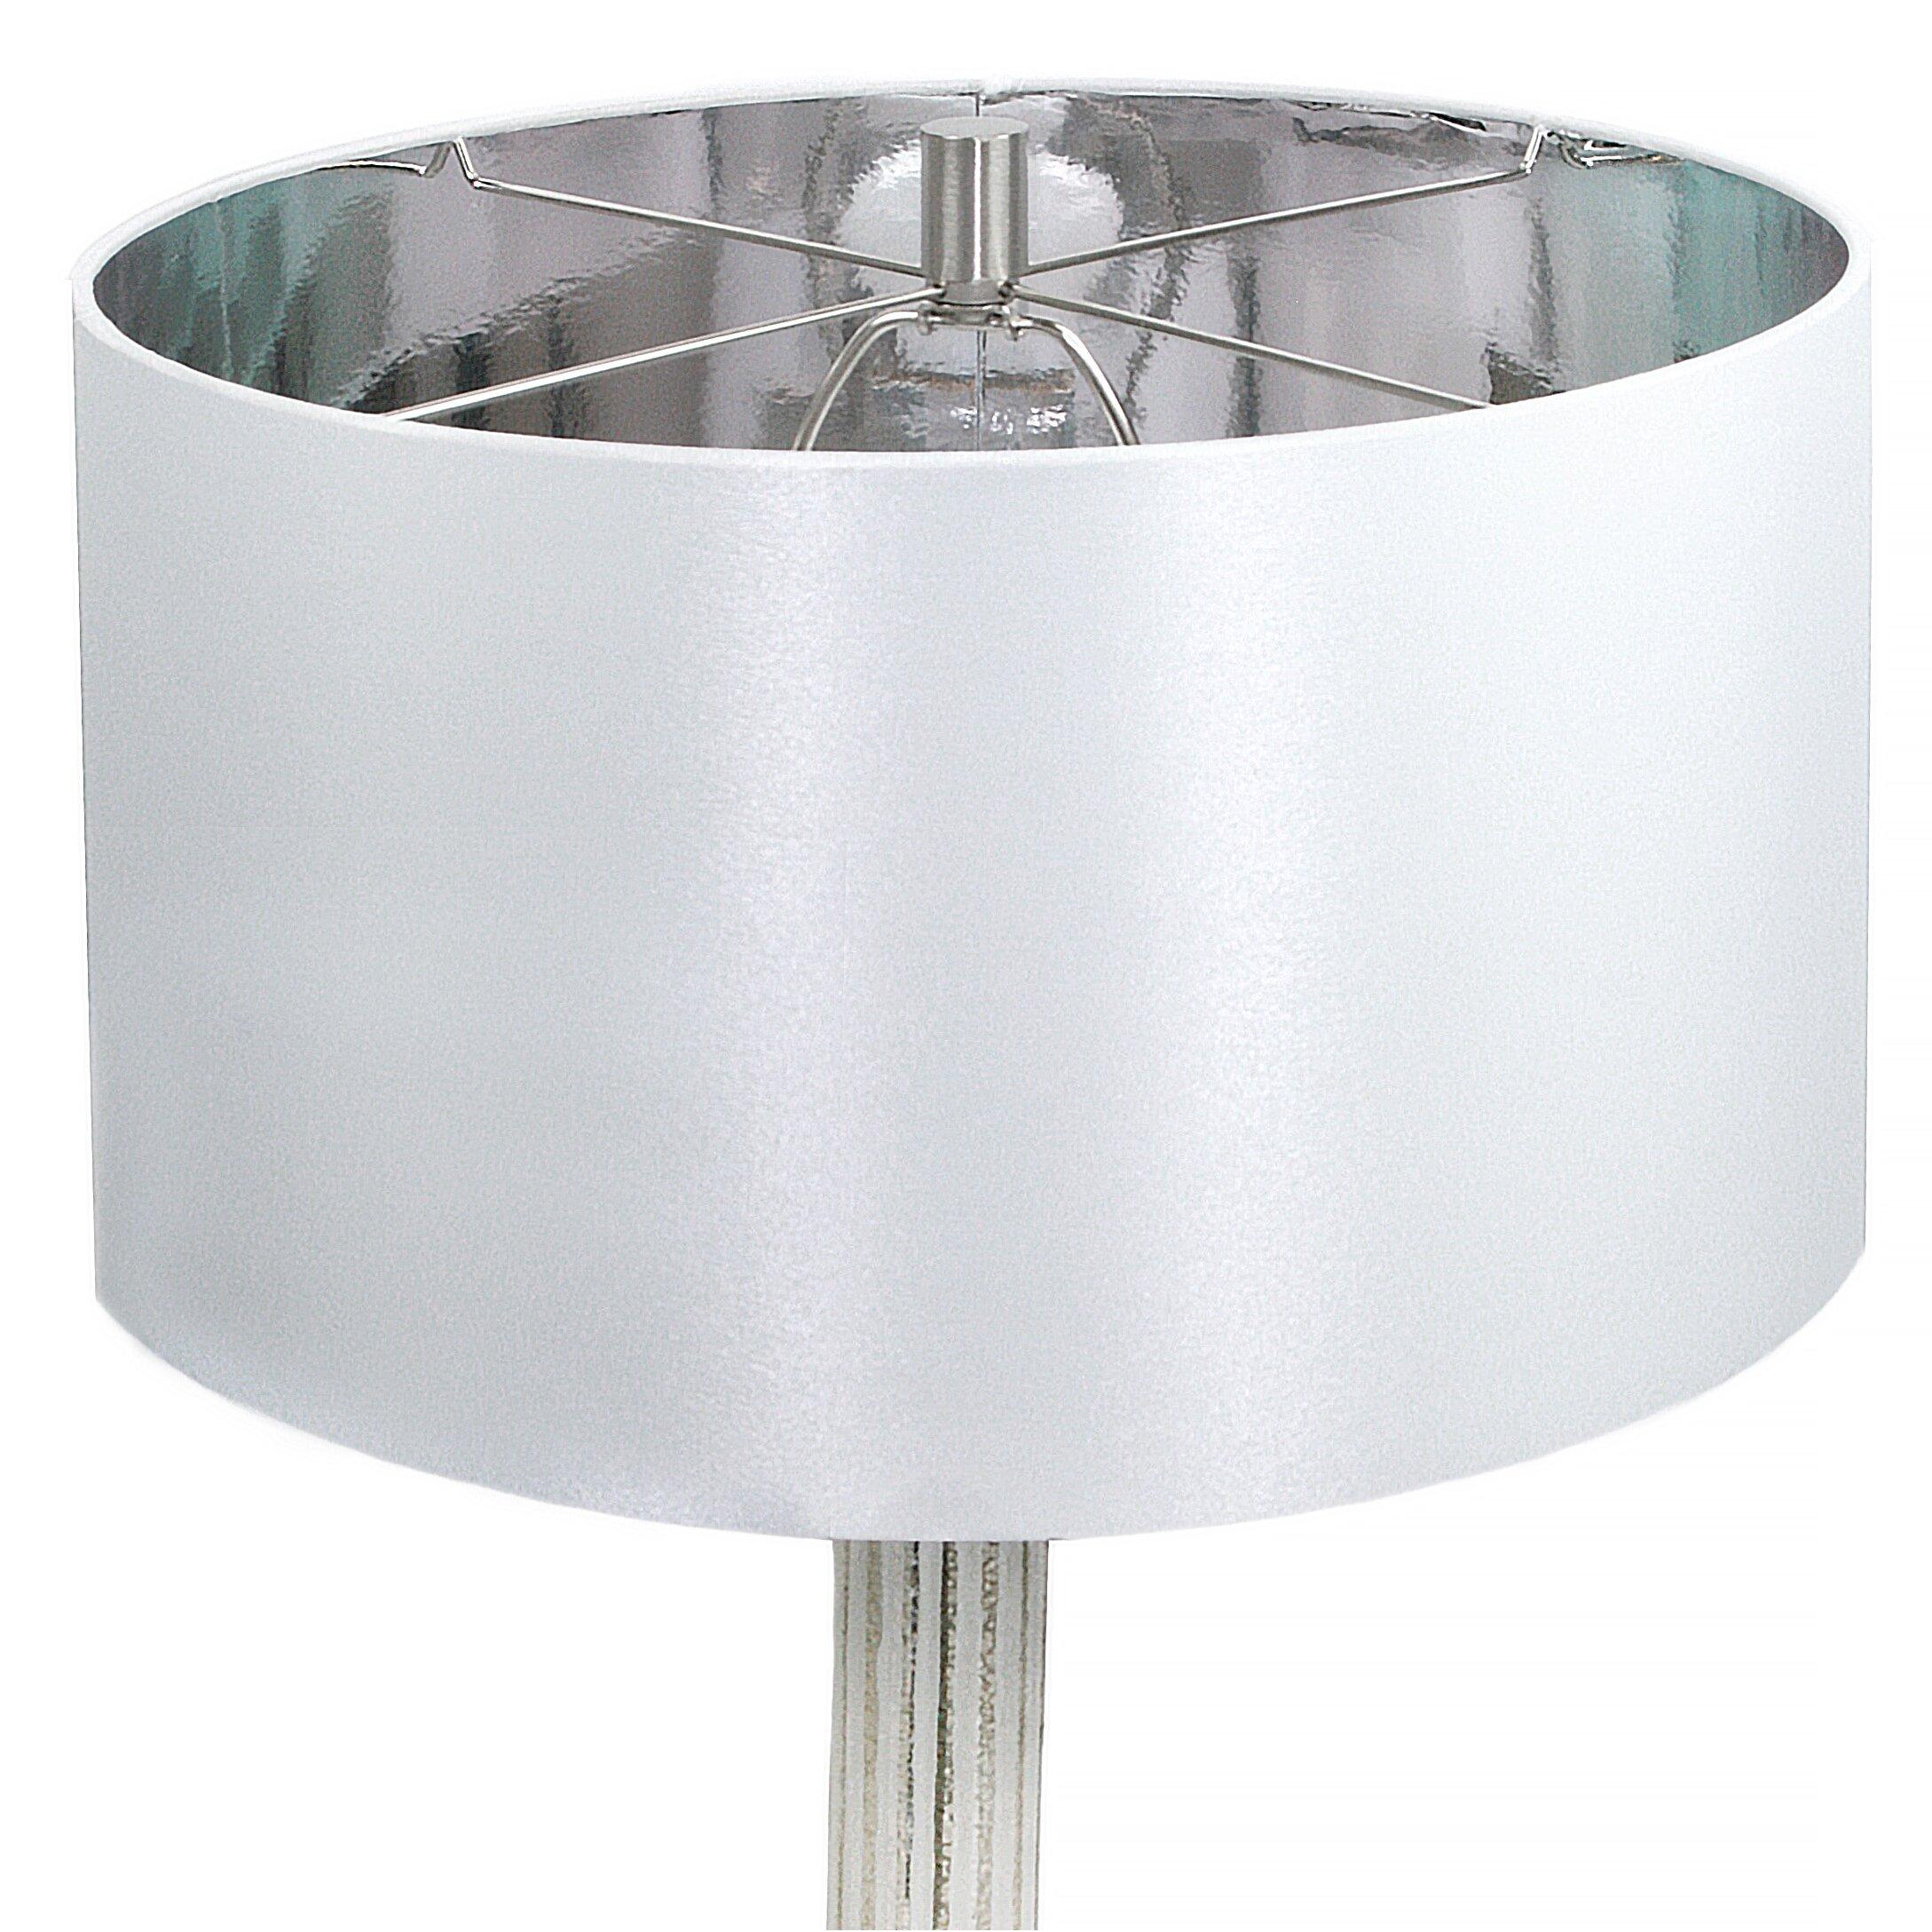 grandview gallery glass 33 table lamp wayfair. Black Bedroom Furniture Sets. Home Design Ideas